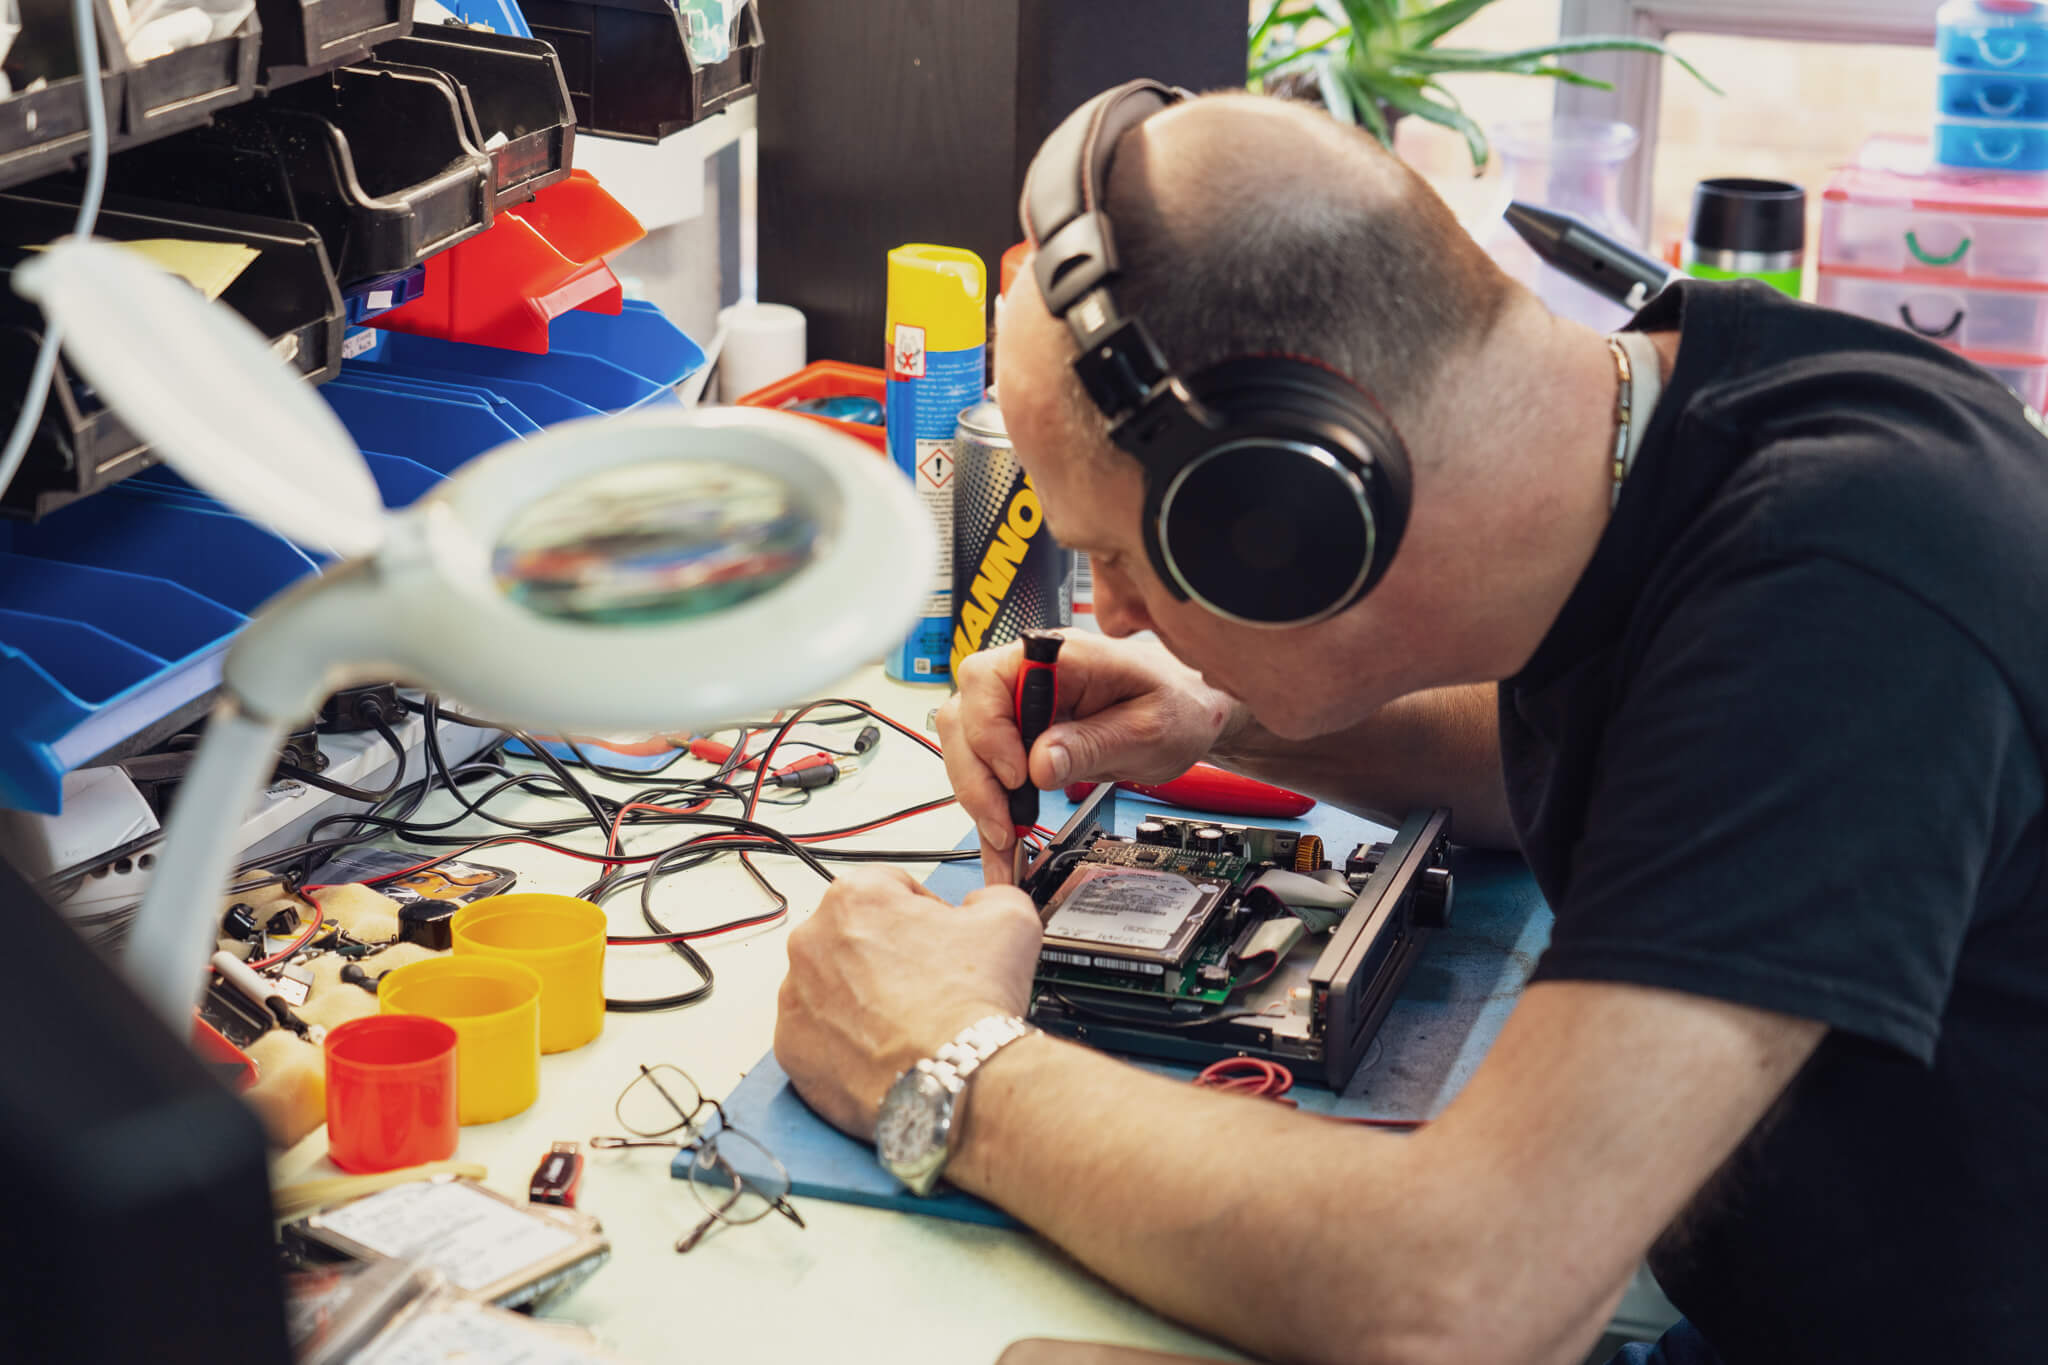 Jon repairing Brennan device